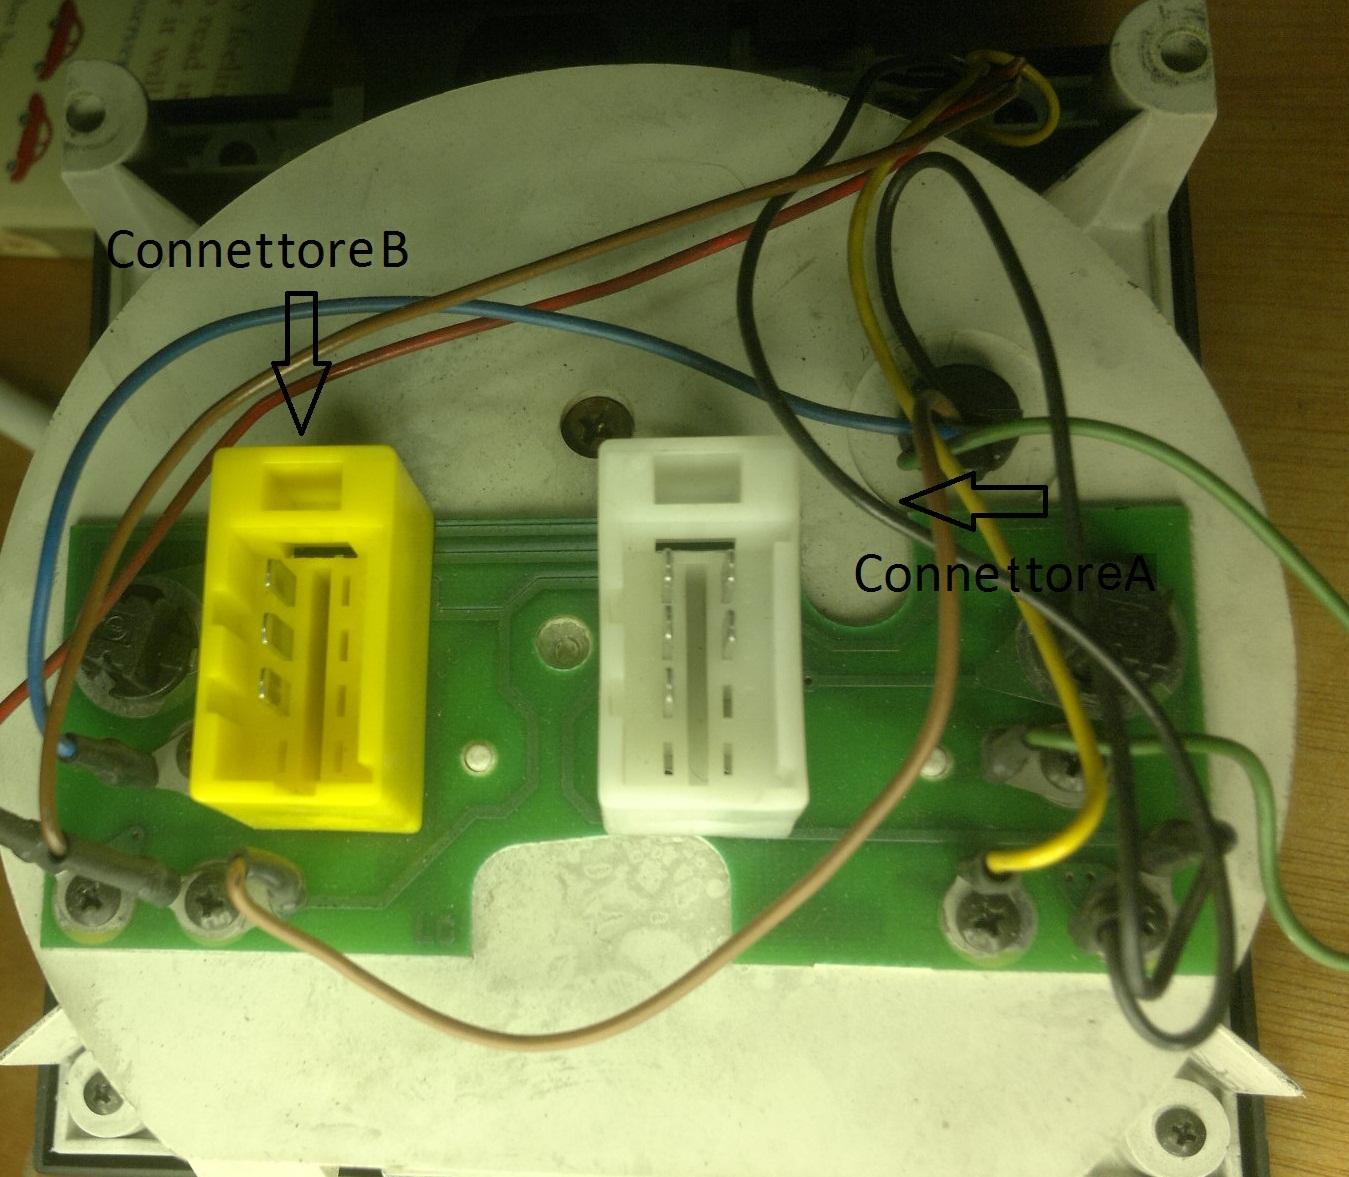 Iveco Daily Speedo Wiring Diagram : Tachimetro